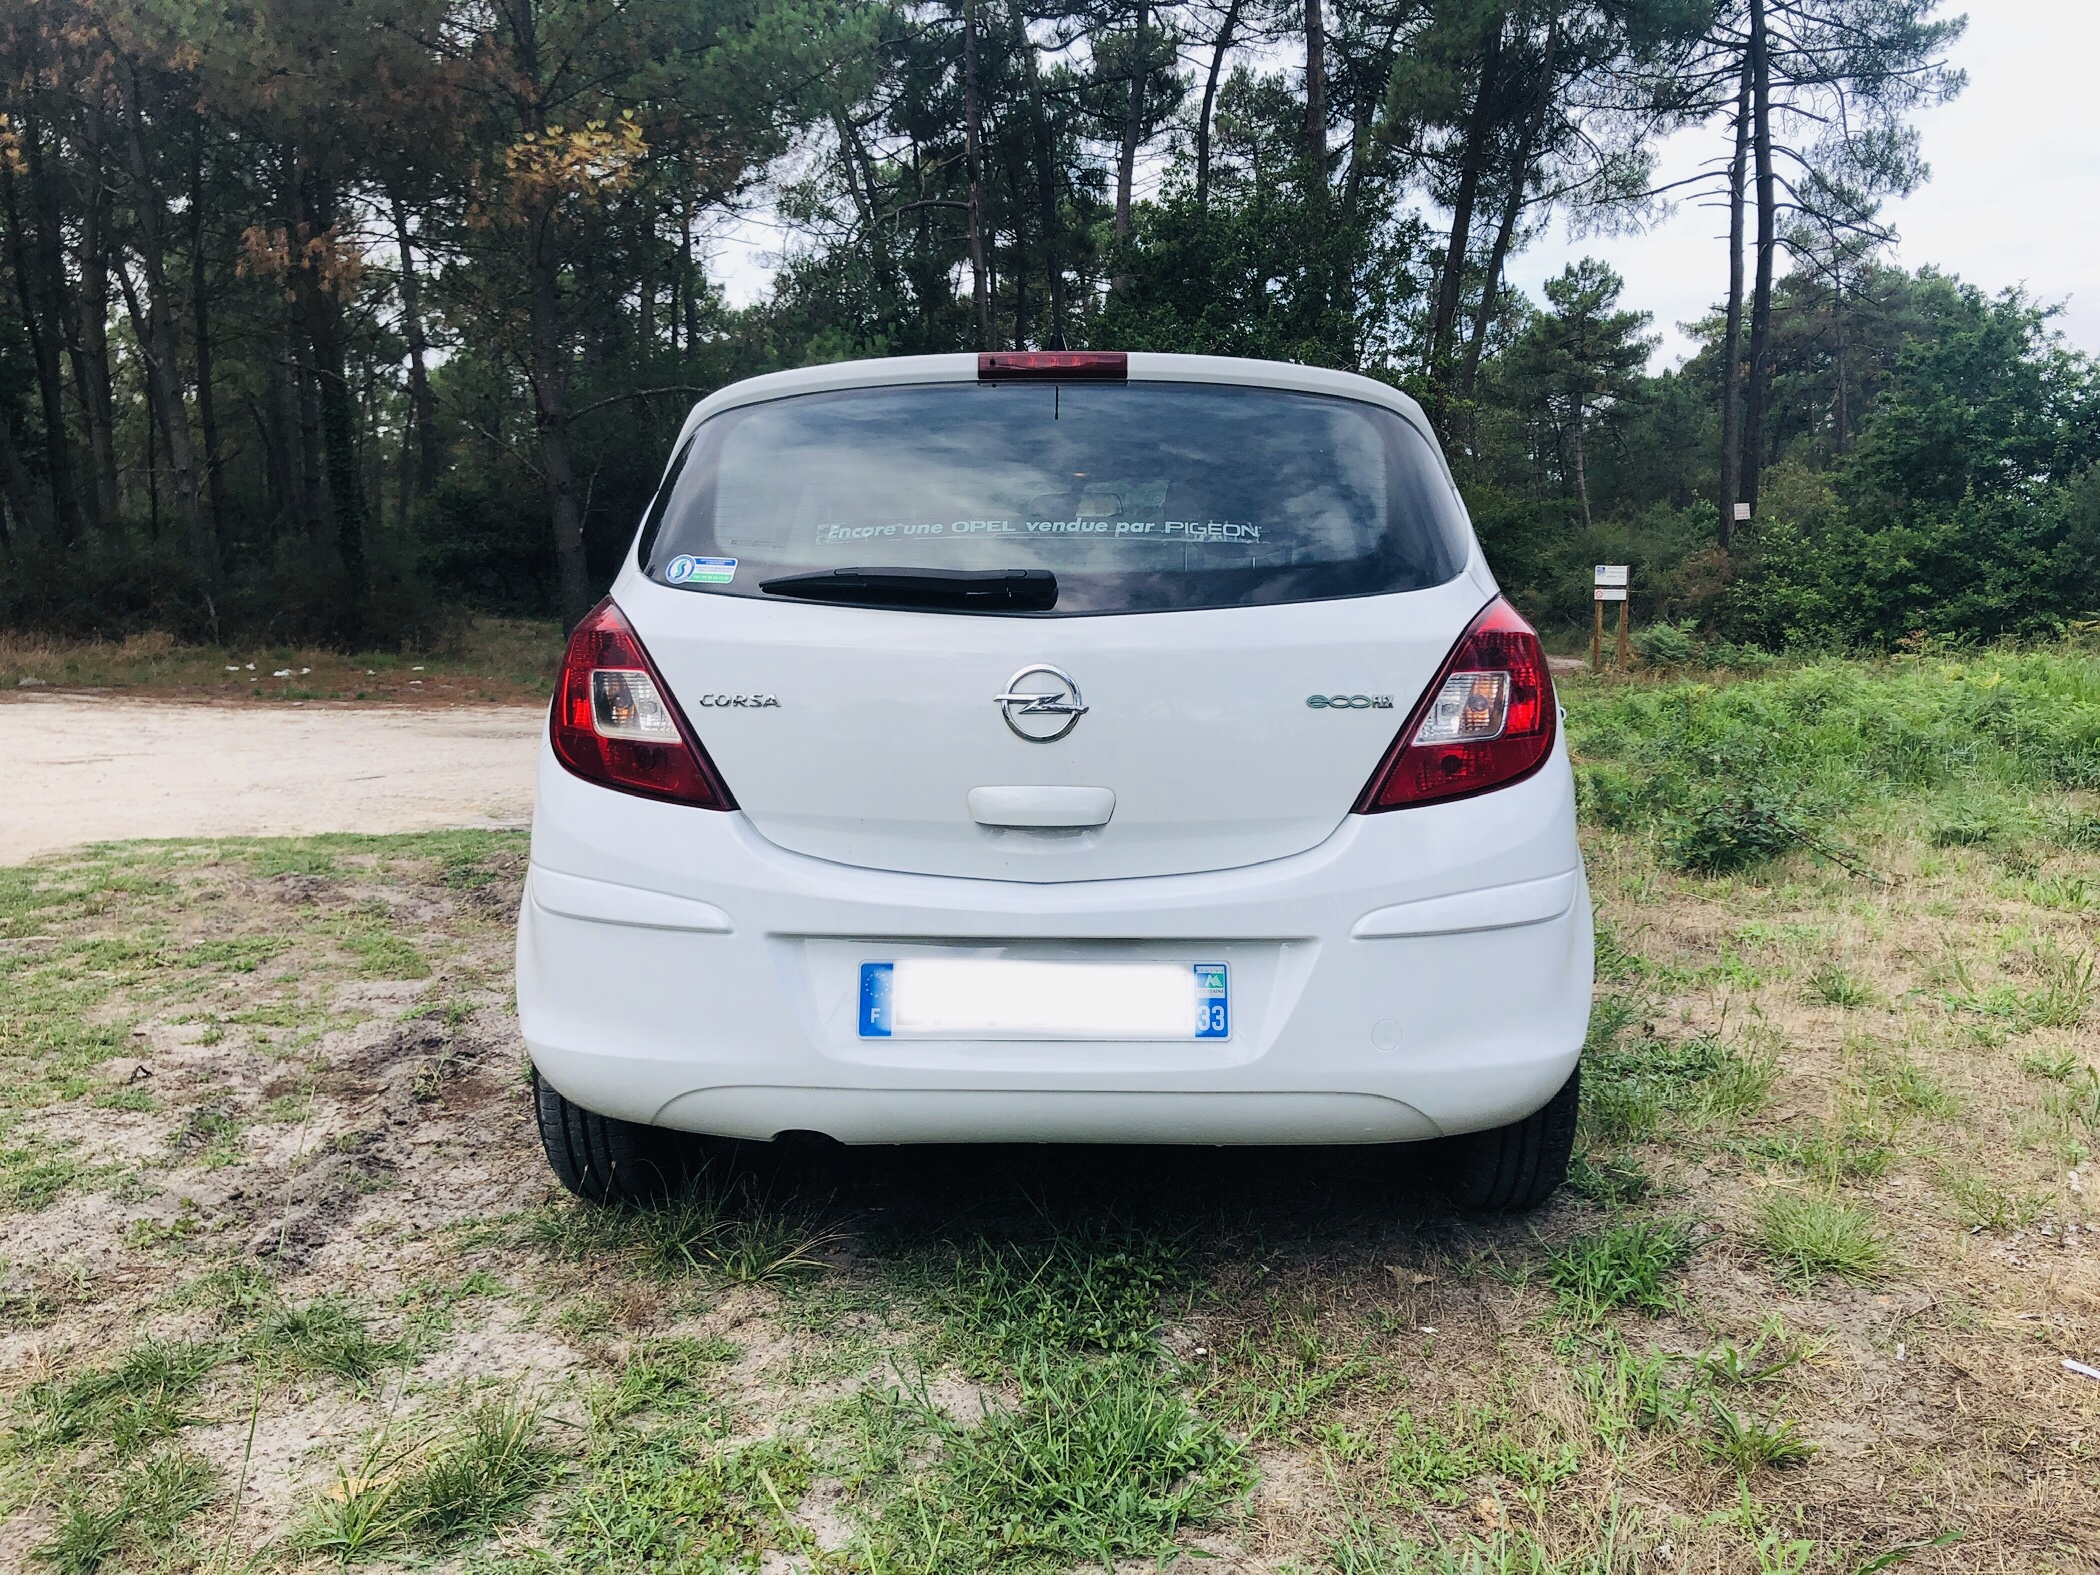 A vendre Opel CORSA 5P 1.3 CDTI (95ch) ecoFLEX Start/Stop